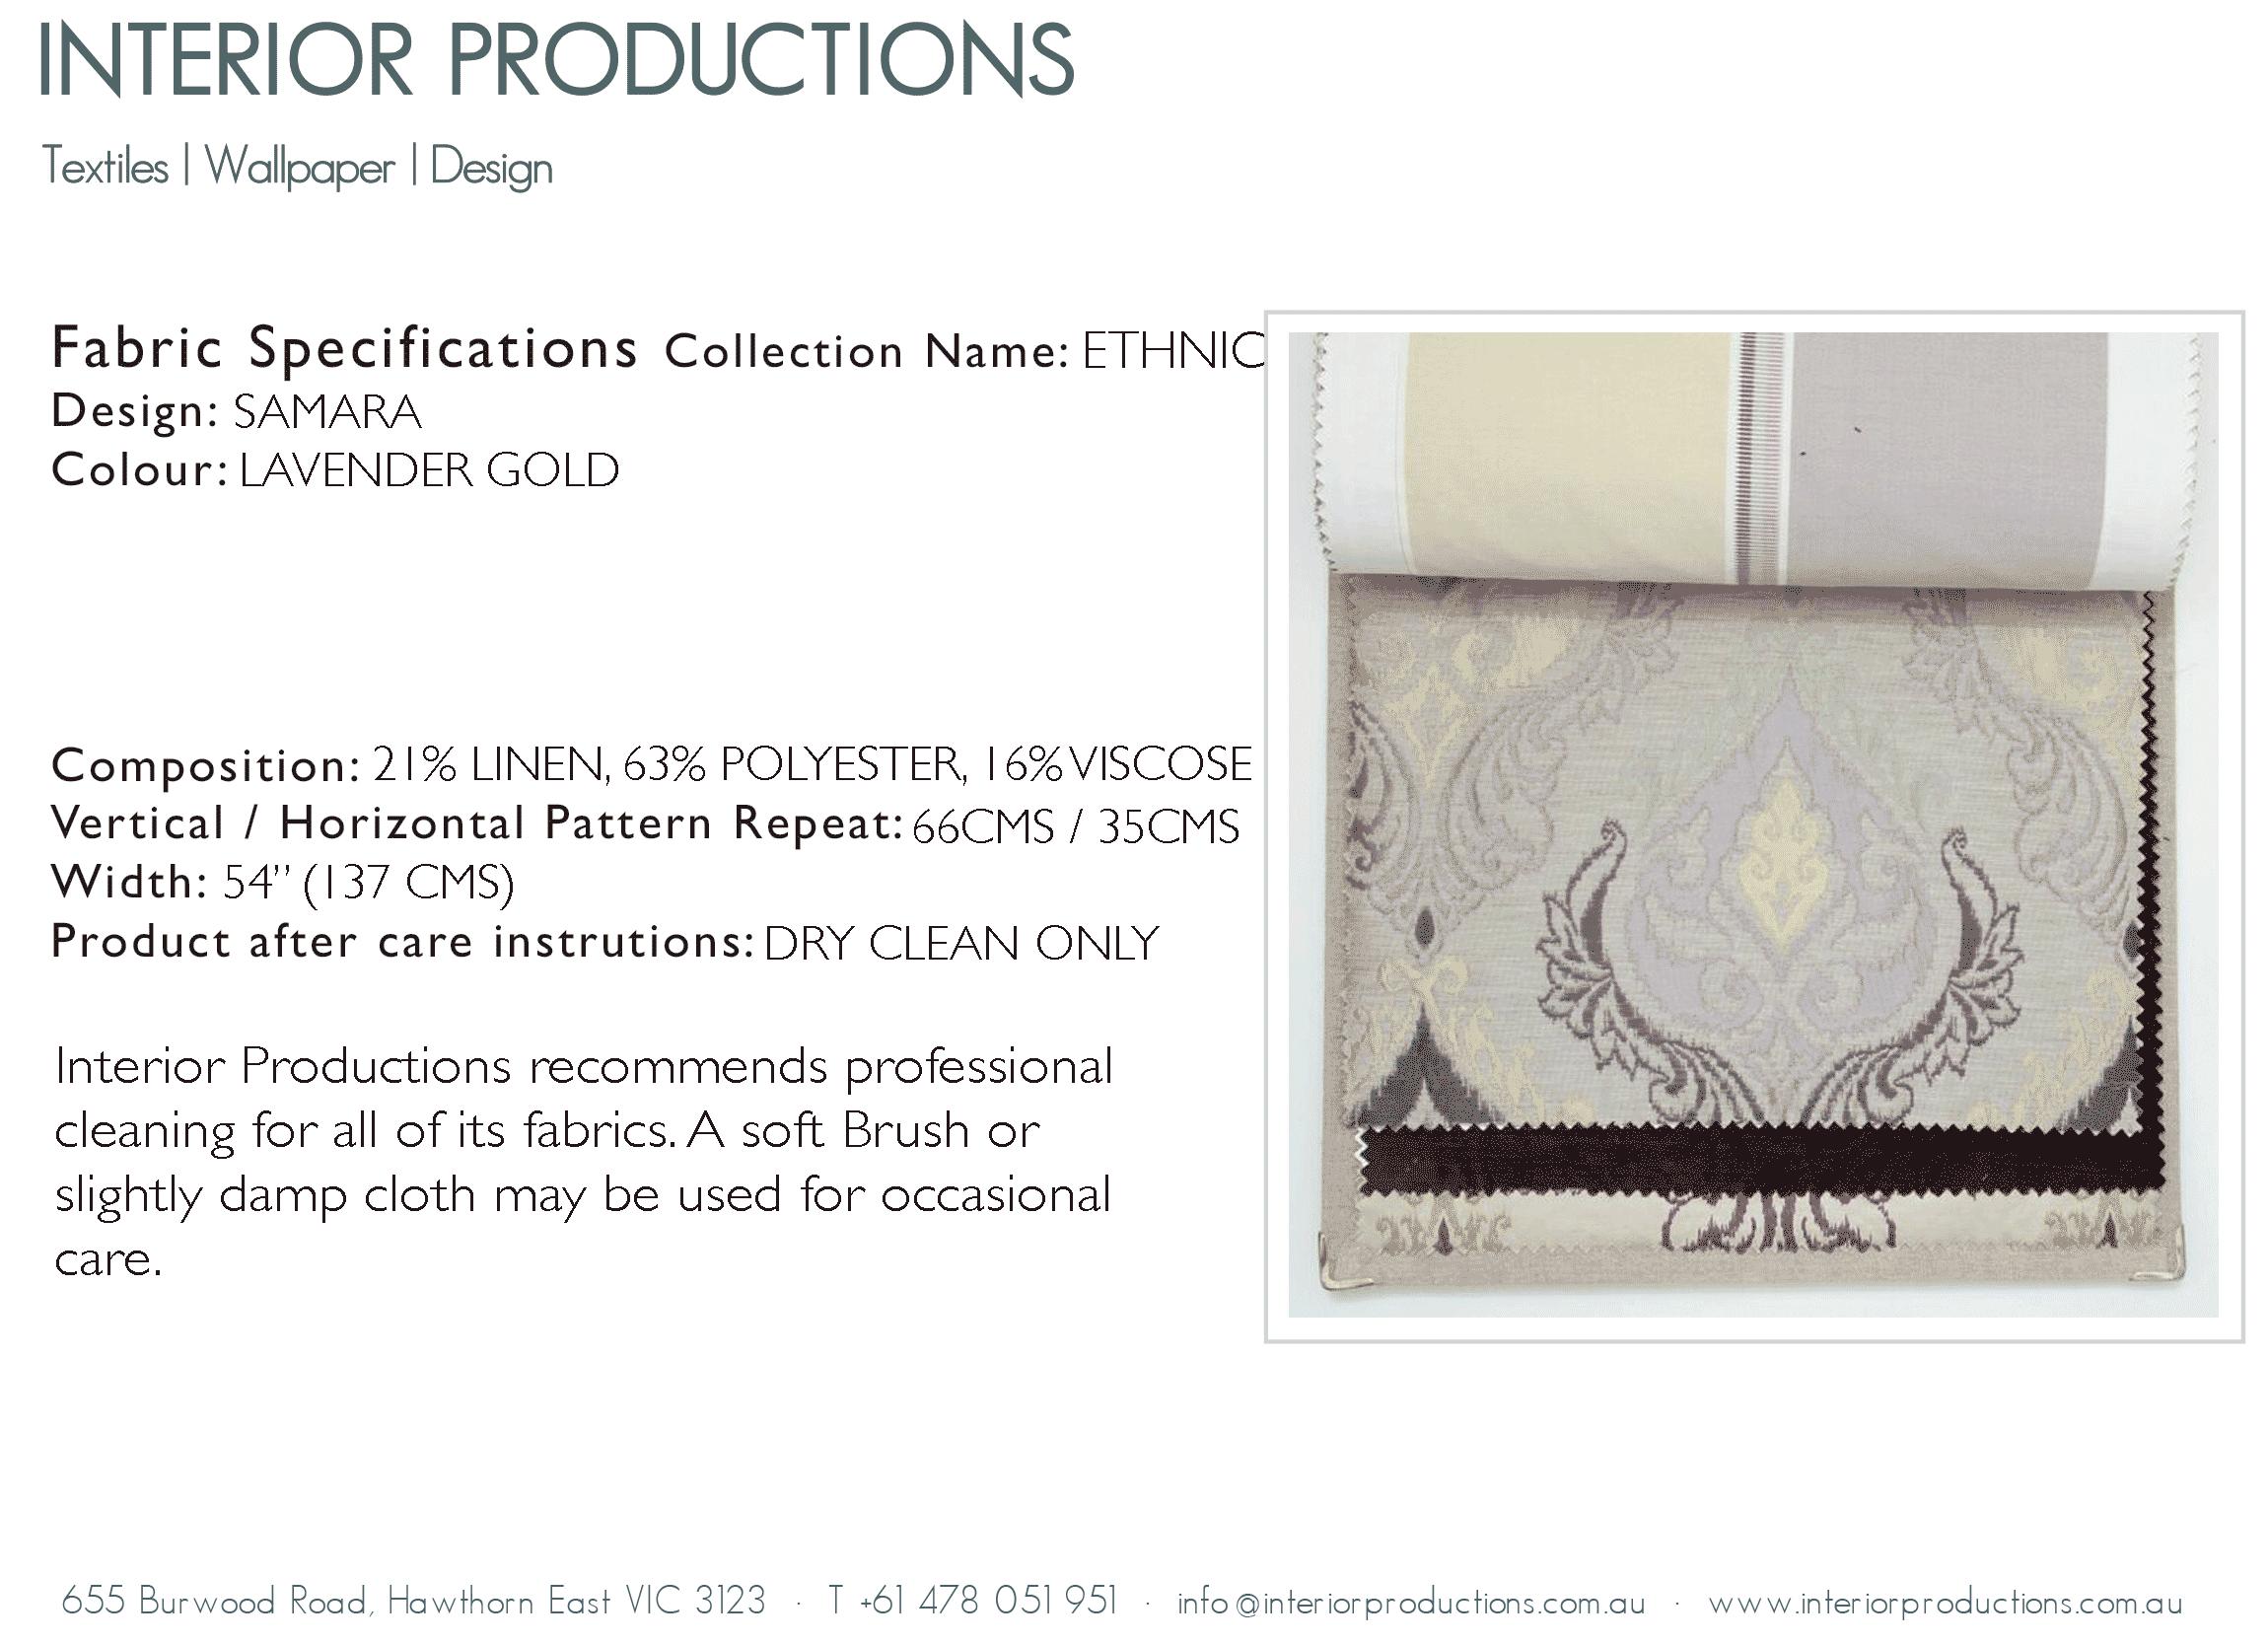 interior_productions_SAMARA---LAVENDER-GOLD